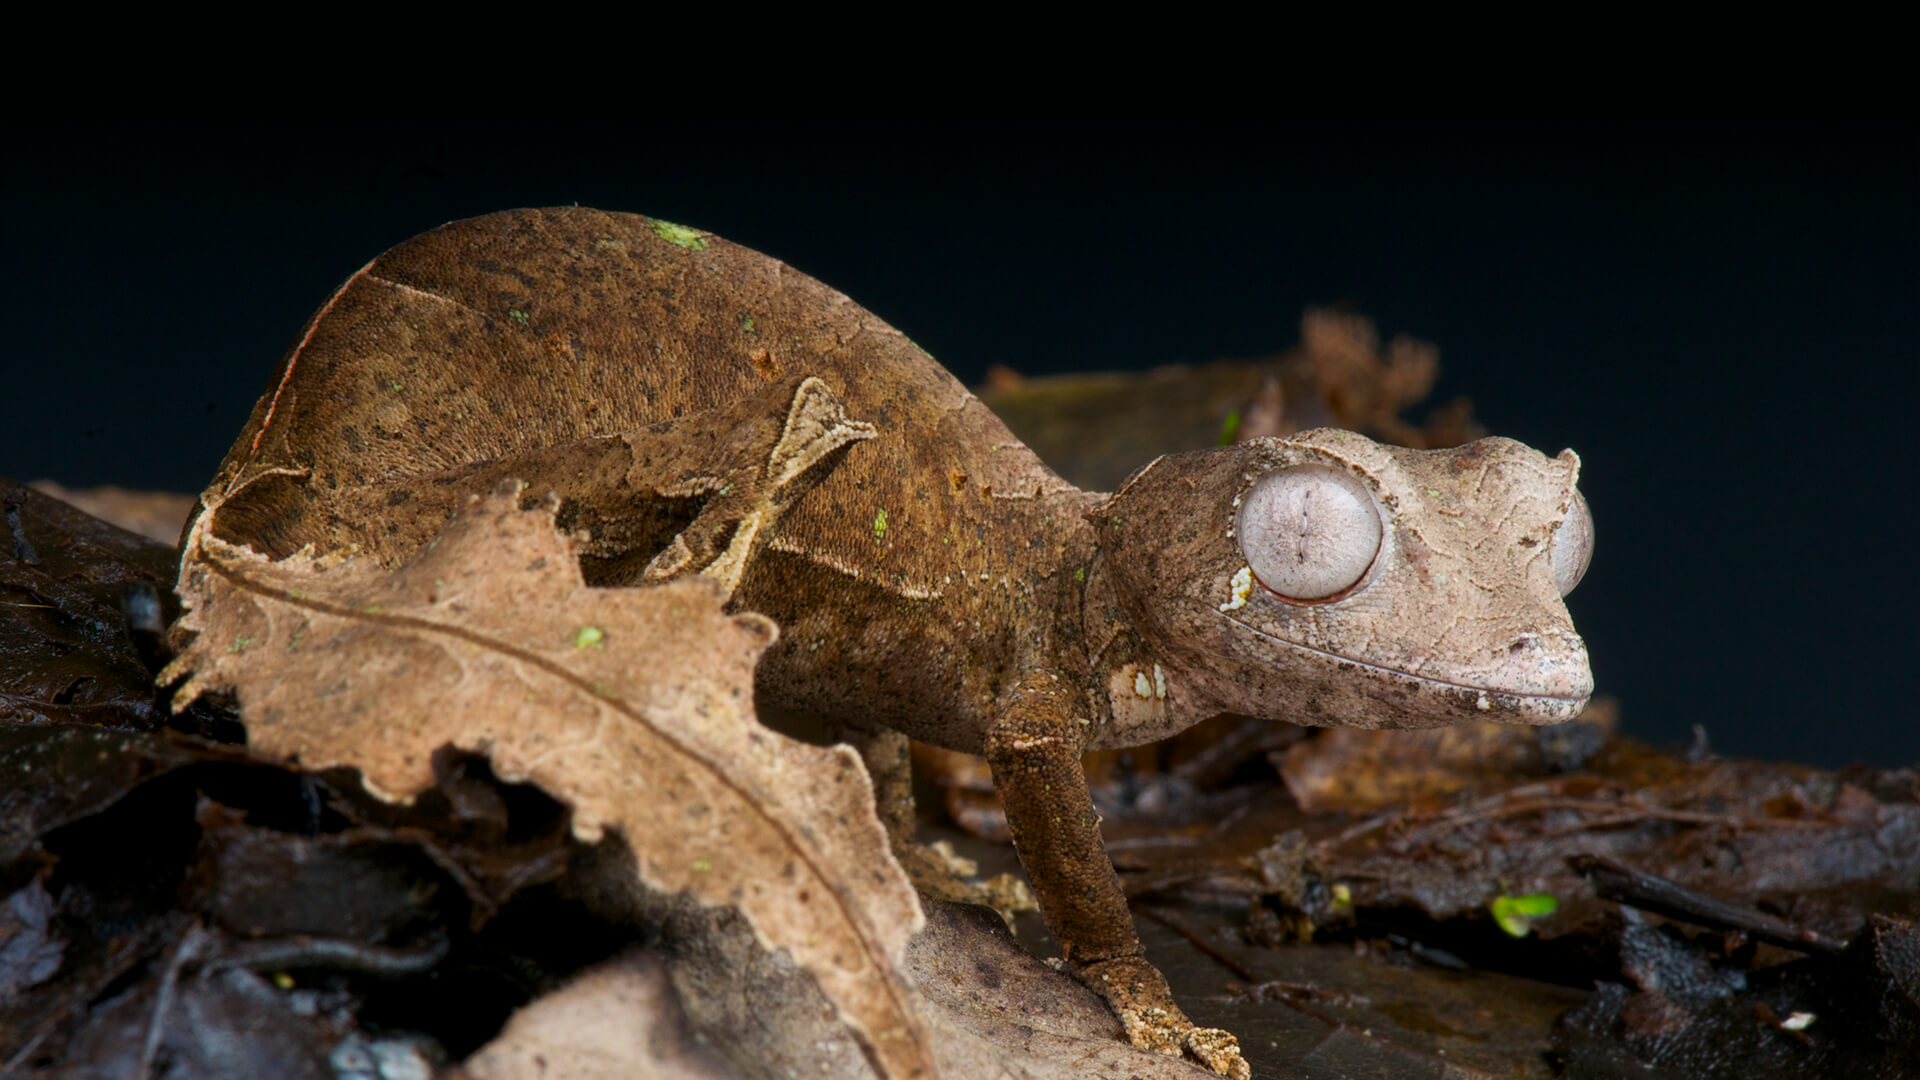 Reptiles | San Diego Zoo Animals & Plants